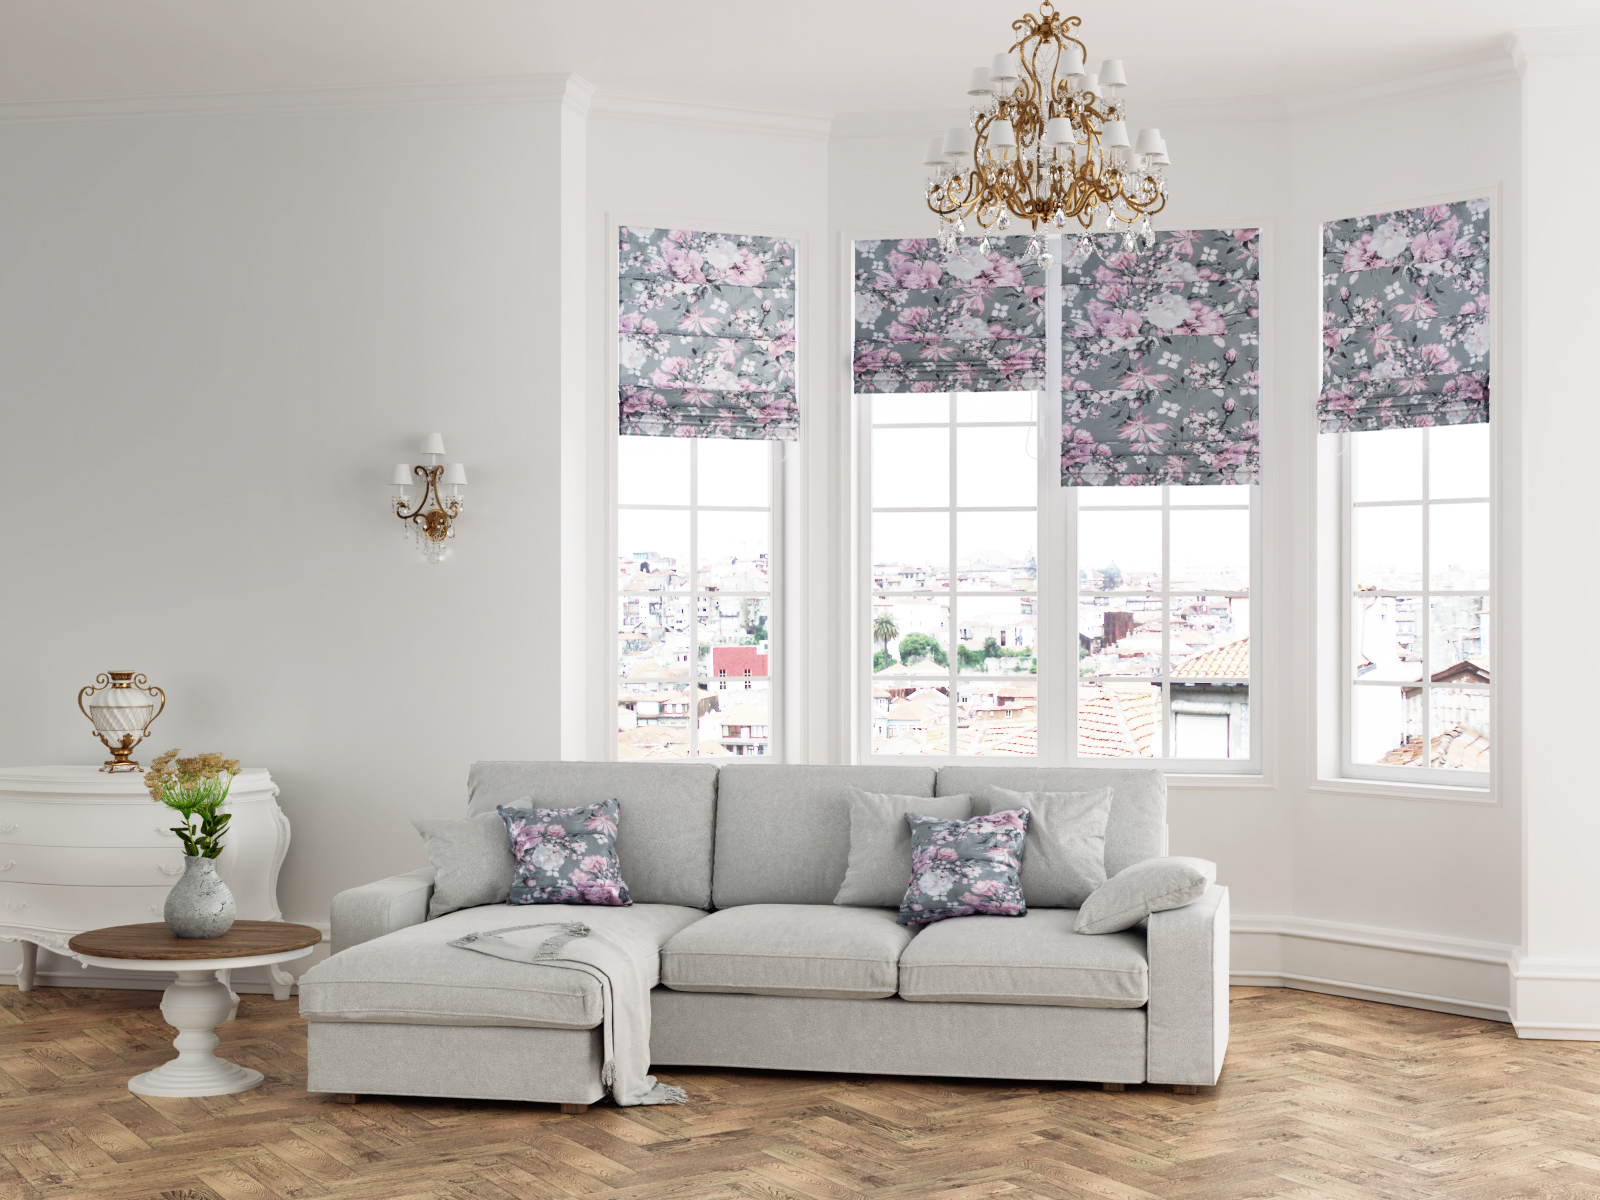 premium raffrollo blumen grau weiss rosa lila faltrollo. Black Bedroom Furniture Sets. Home Design Ideas